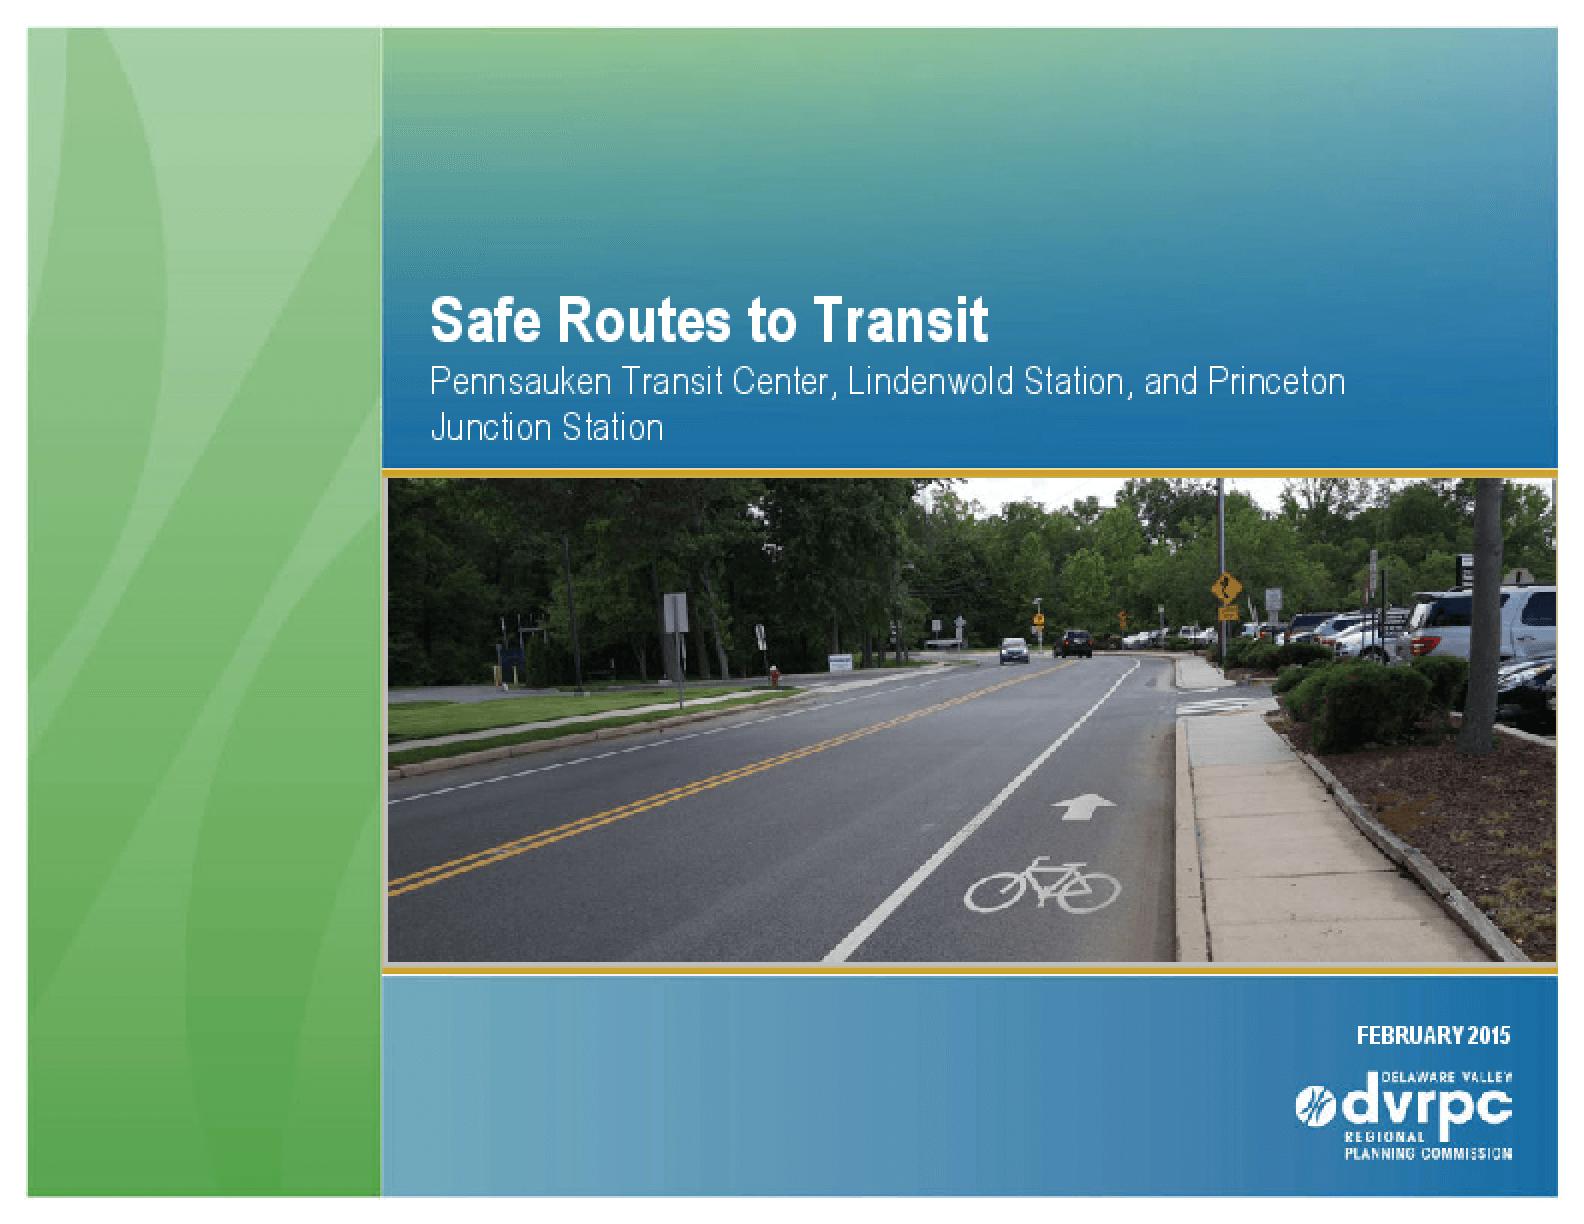 Safe Routes to Transit Pennsauken Transit Center, Lindenwold Station, and Princeton Junction Station